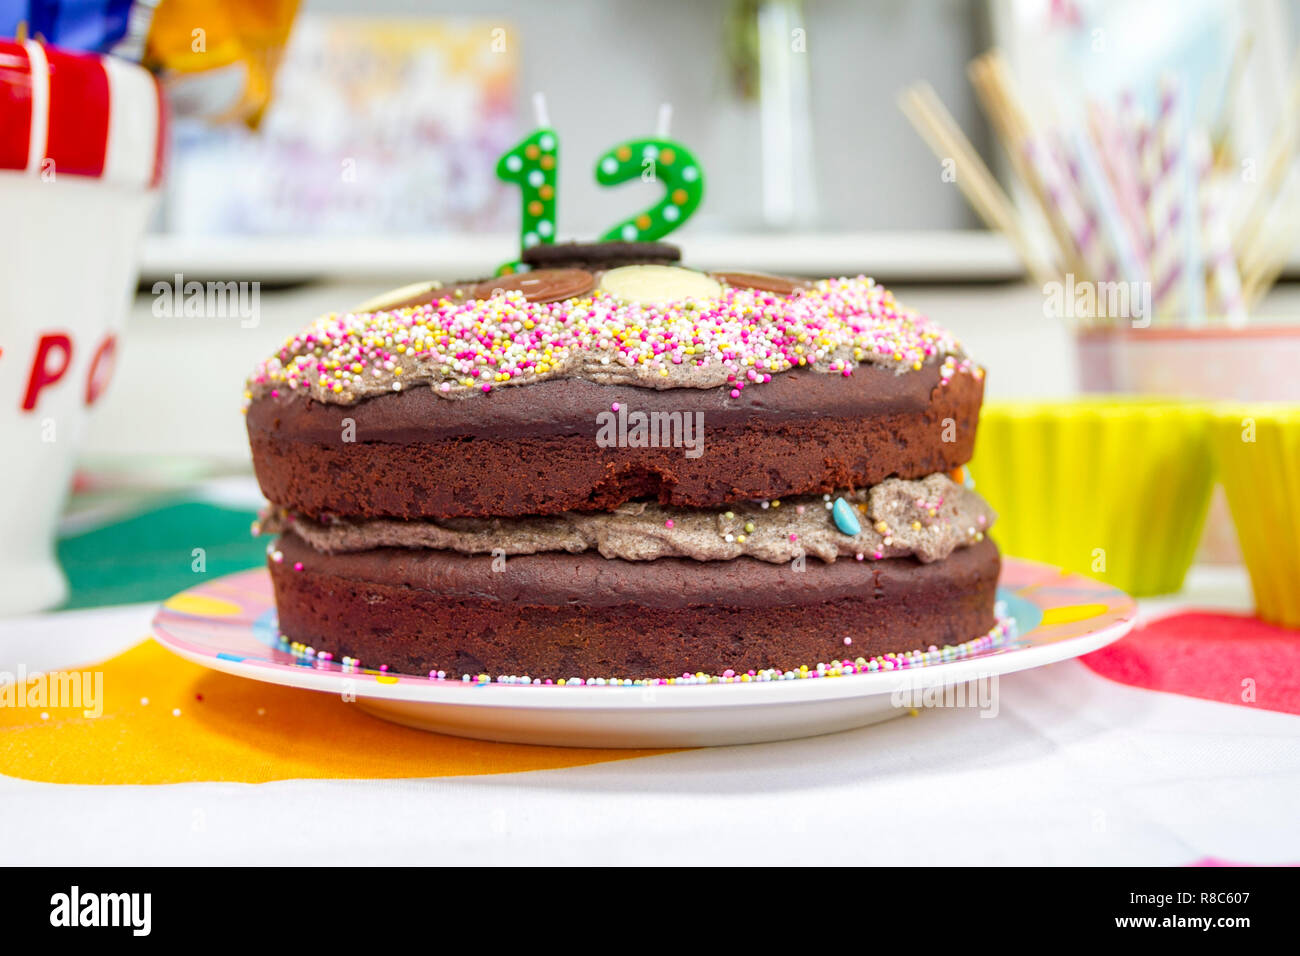 12th Chocolate Birthday Cake Age 12 Twelve Party Celebration Tween Oreo Homemade Icing Sprinkles Kids Concept